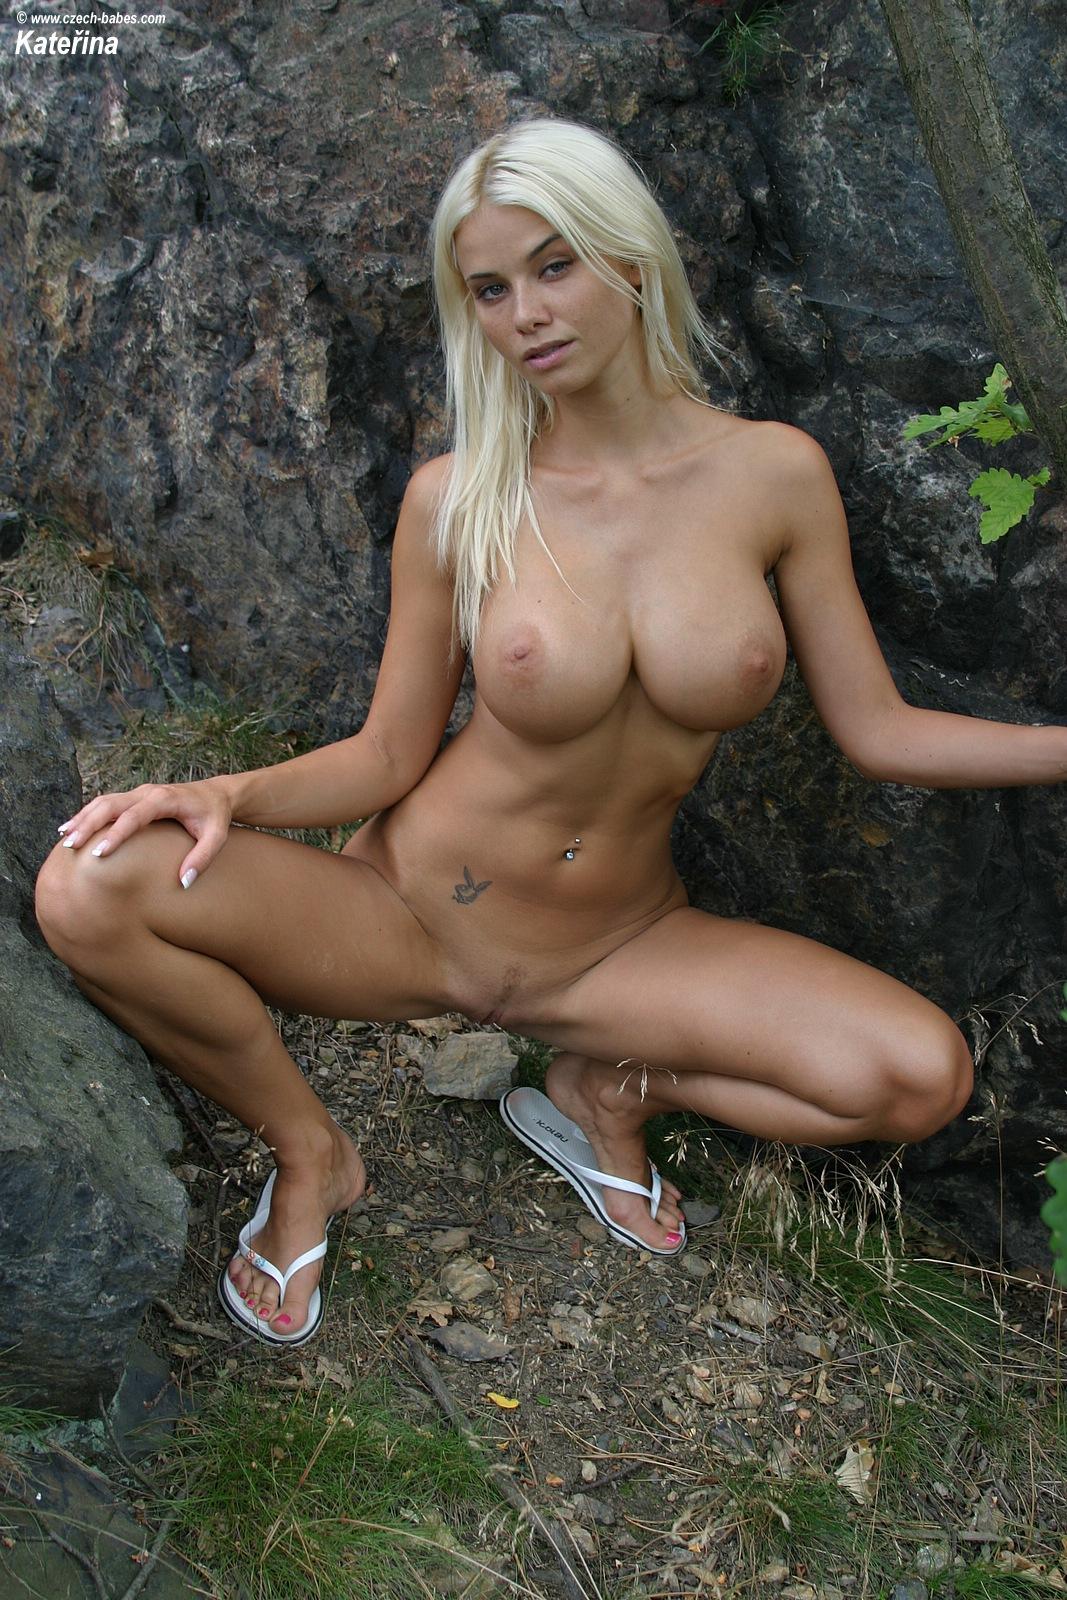 katerina-blonde-boobs-flip-flops-outdoor-naked-27